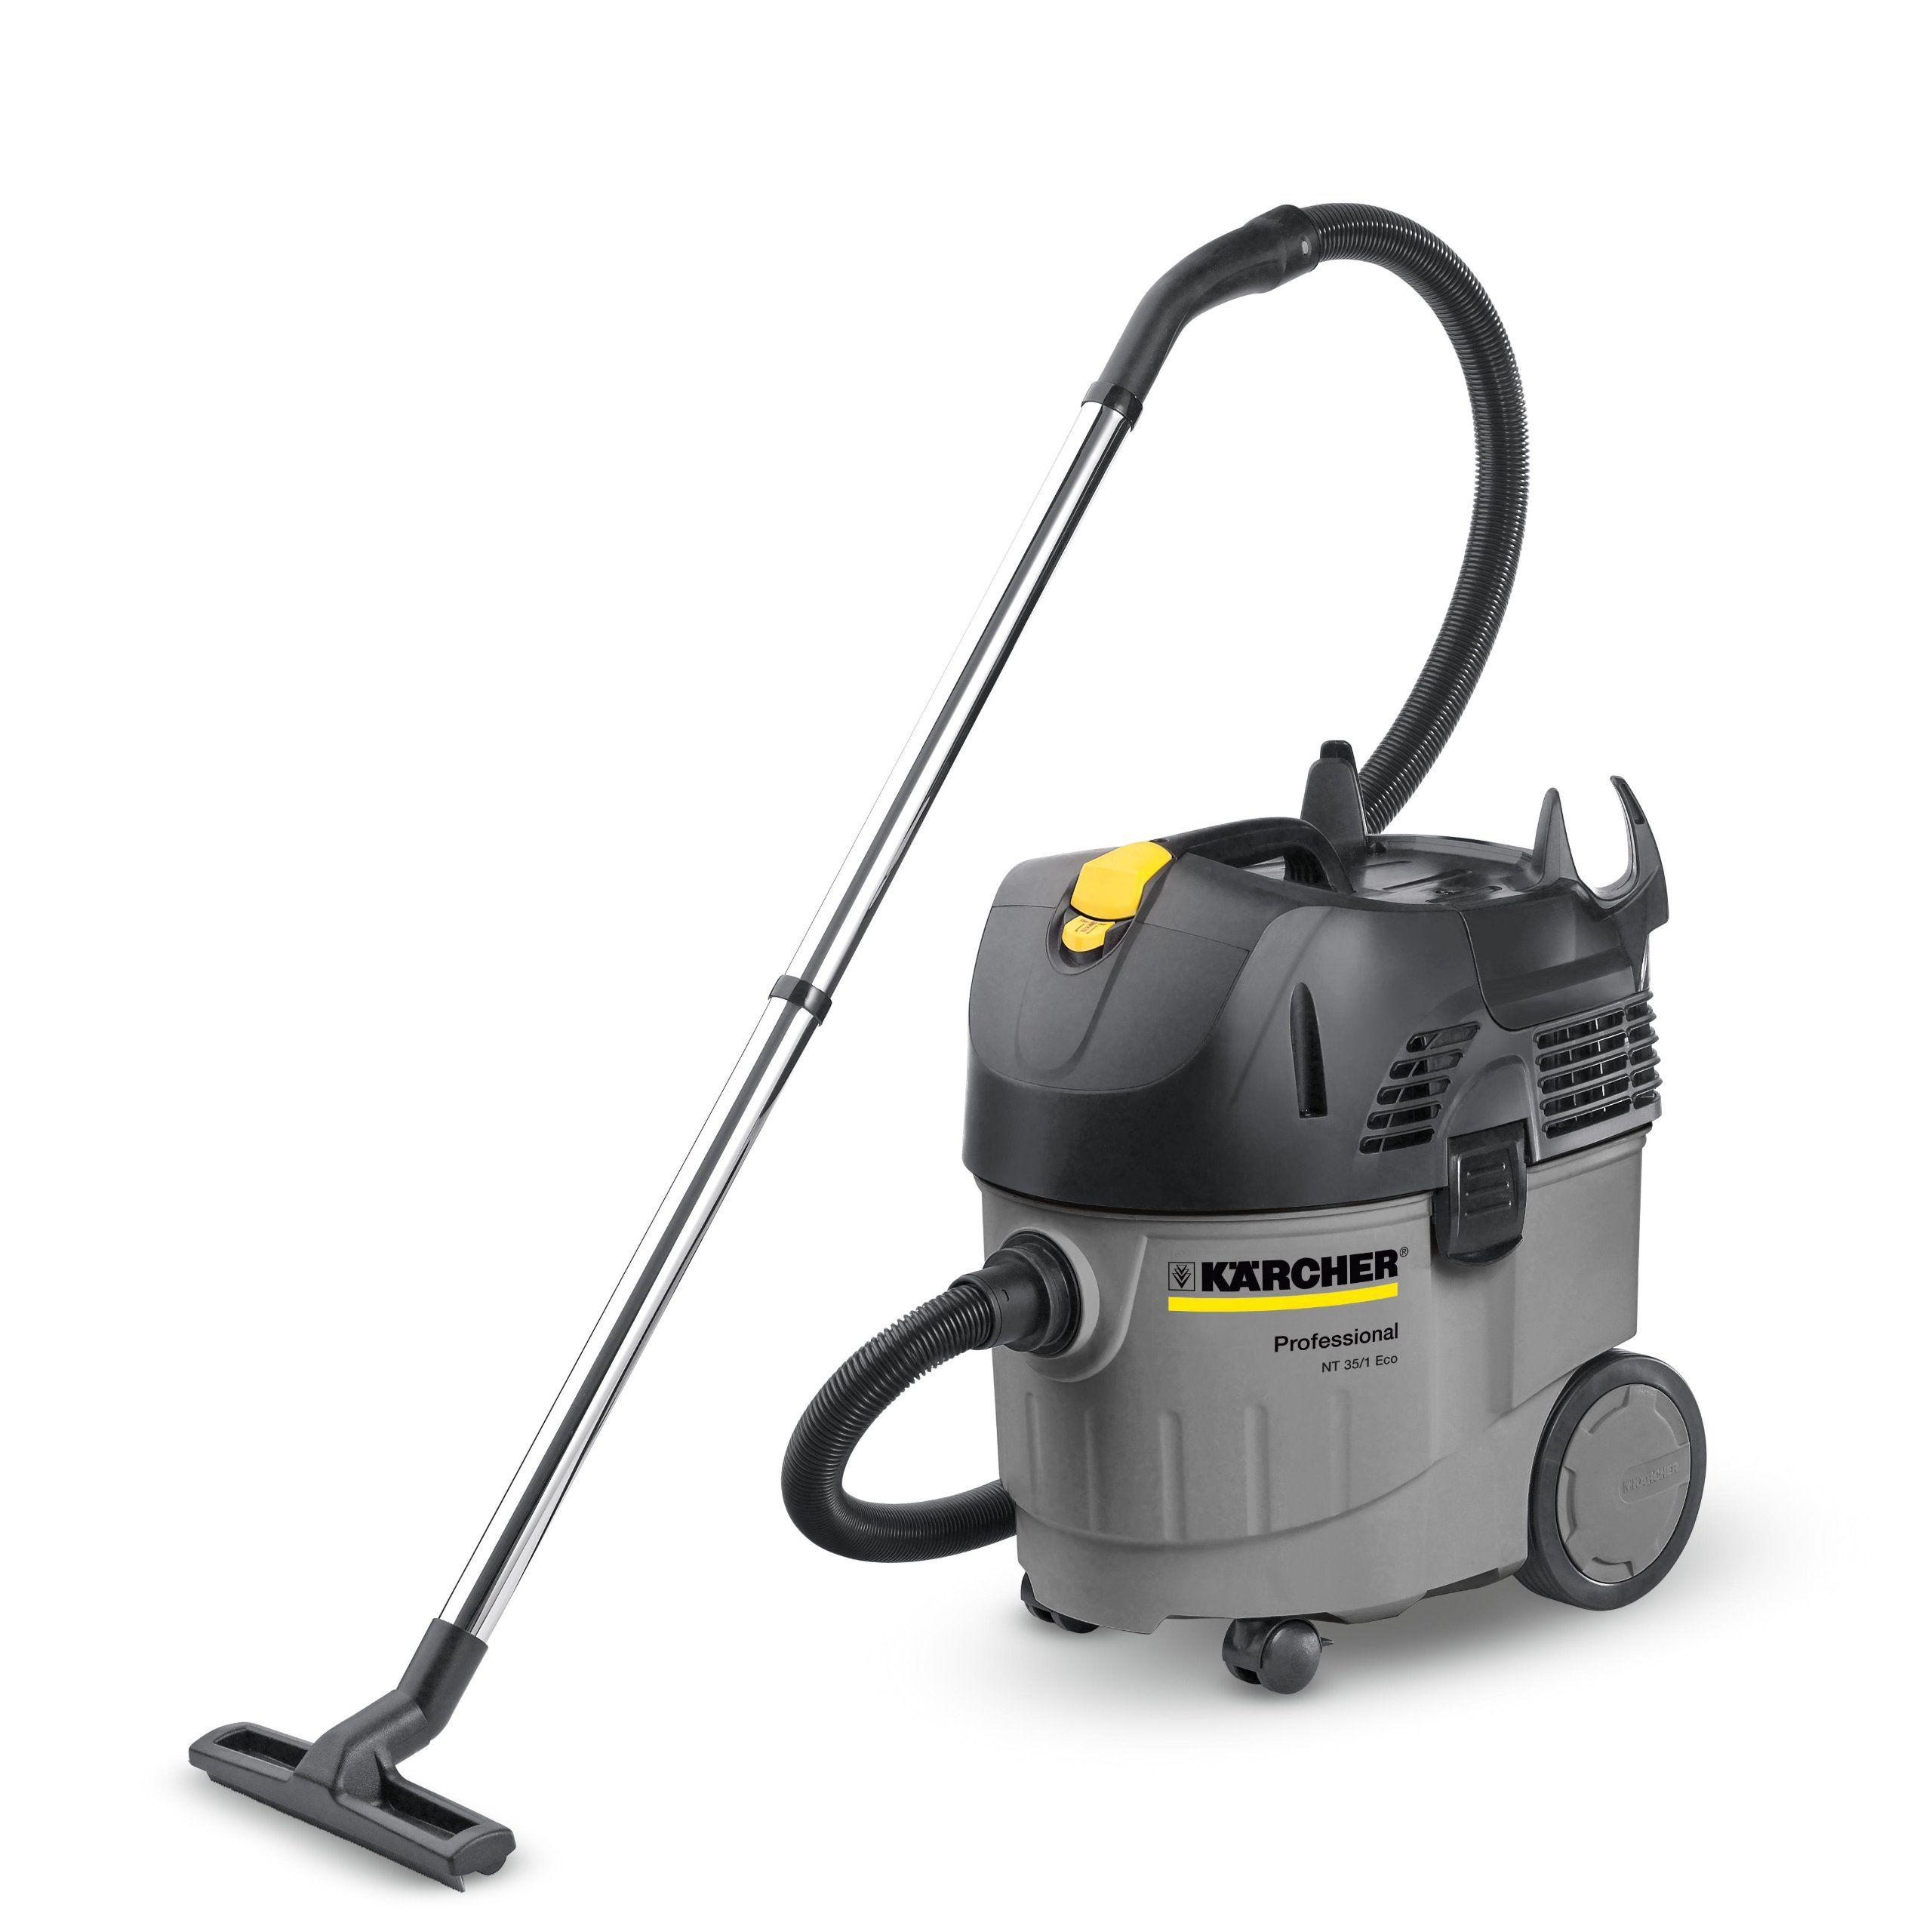 Http Ecx Images Amazon Com Images I 8198p H4dfl Sl1500 Jpg Vacuum Cleaner Wet Dry Vacuum Commercial Floor Cleaning